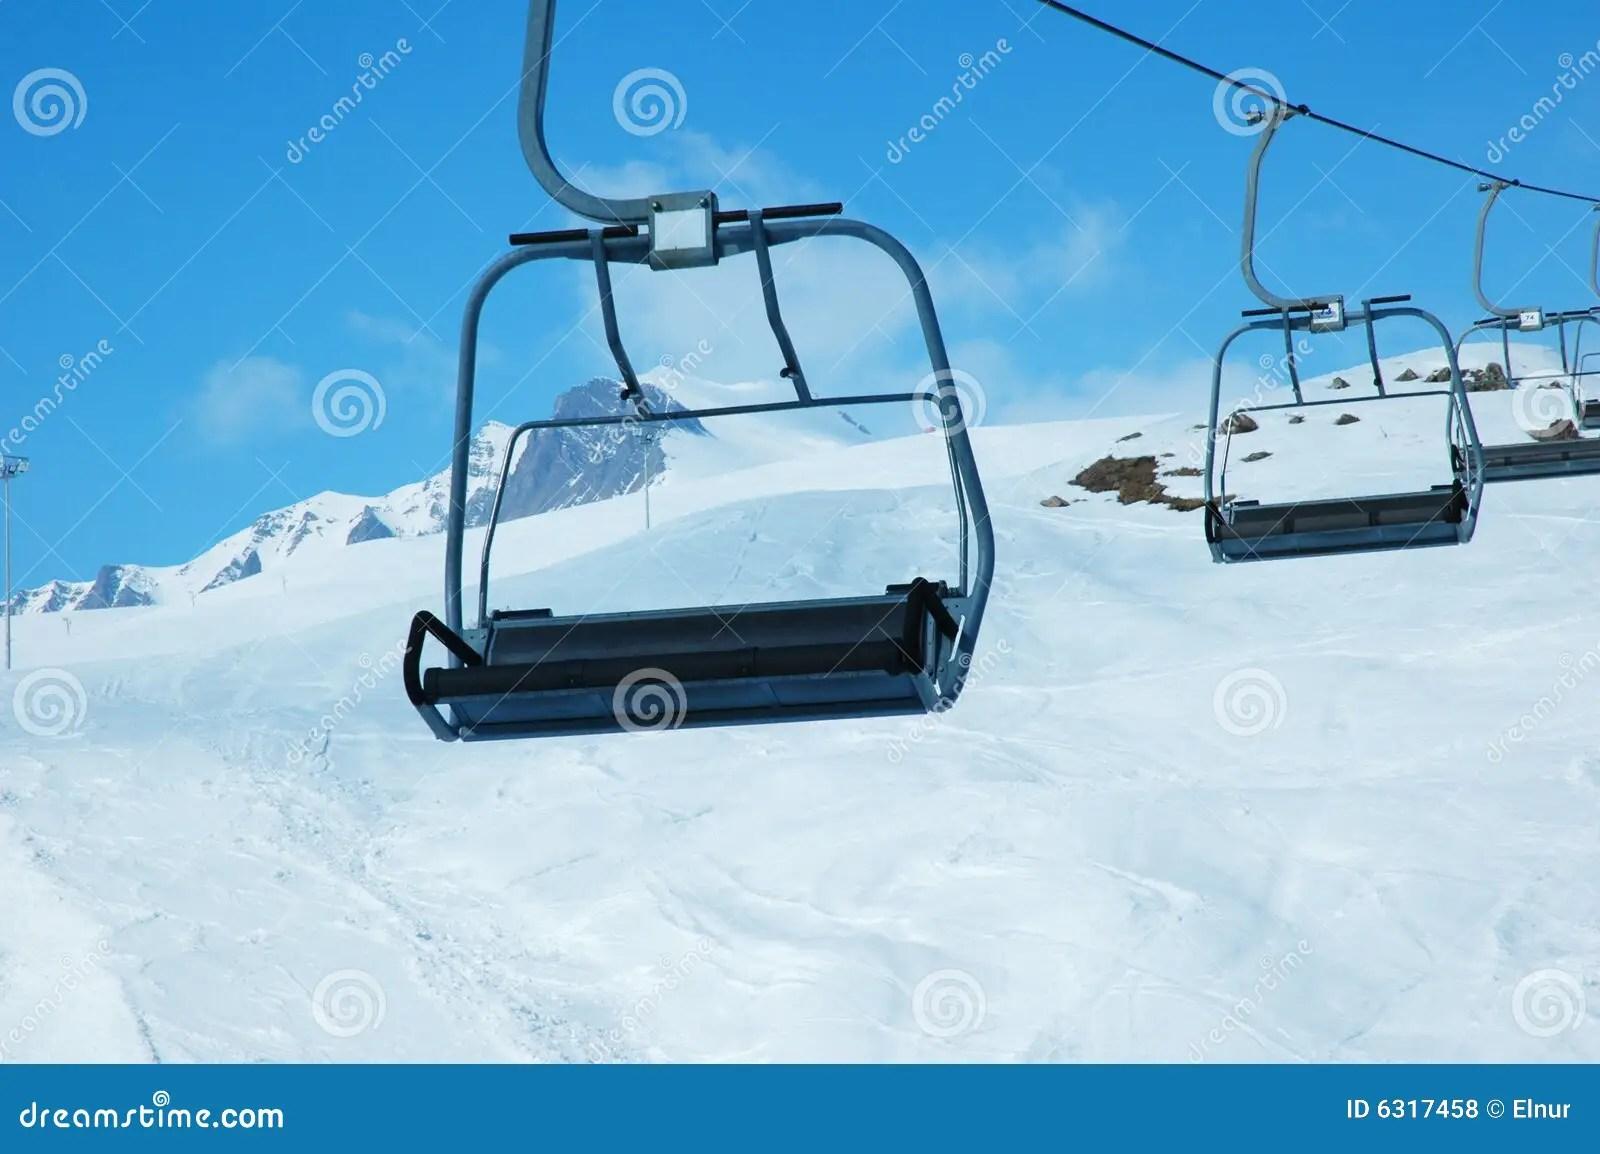 ski chair lift high splat mat australia chairs royalty free stock photos image 6317458